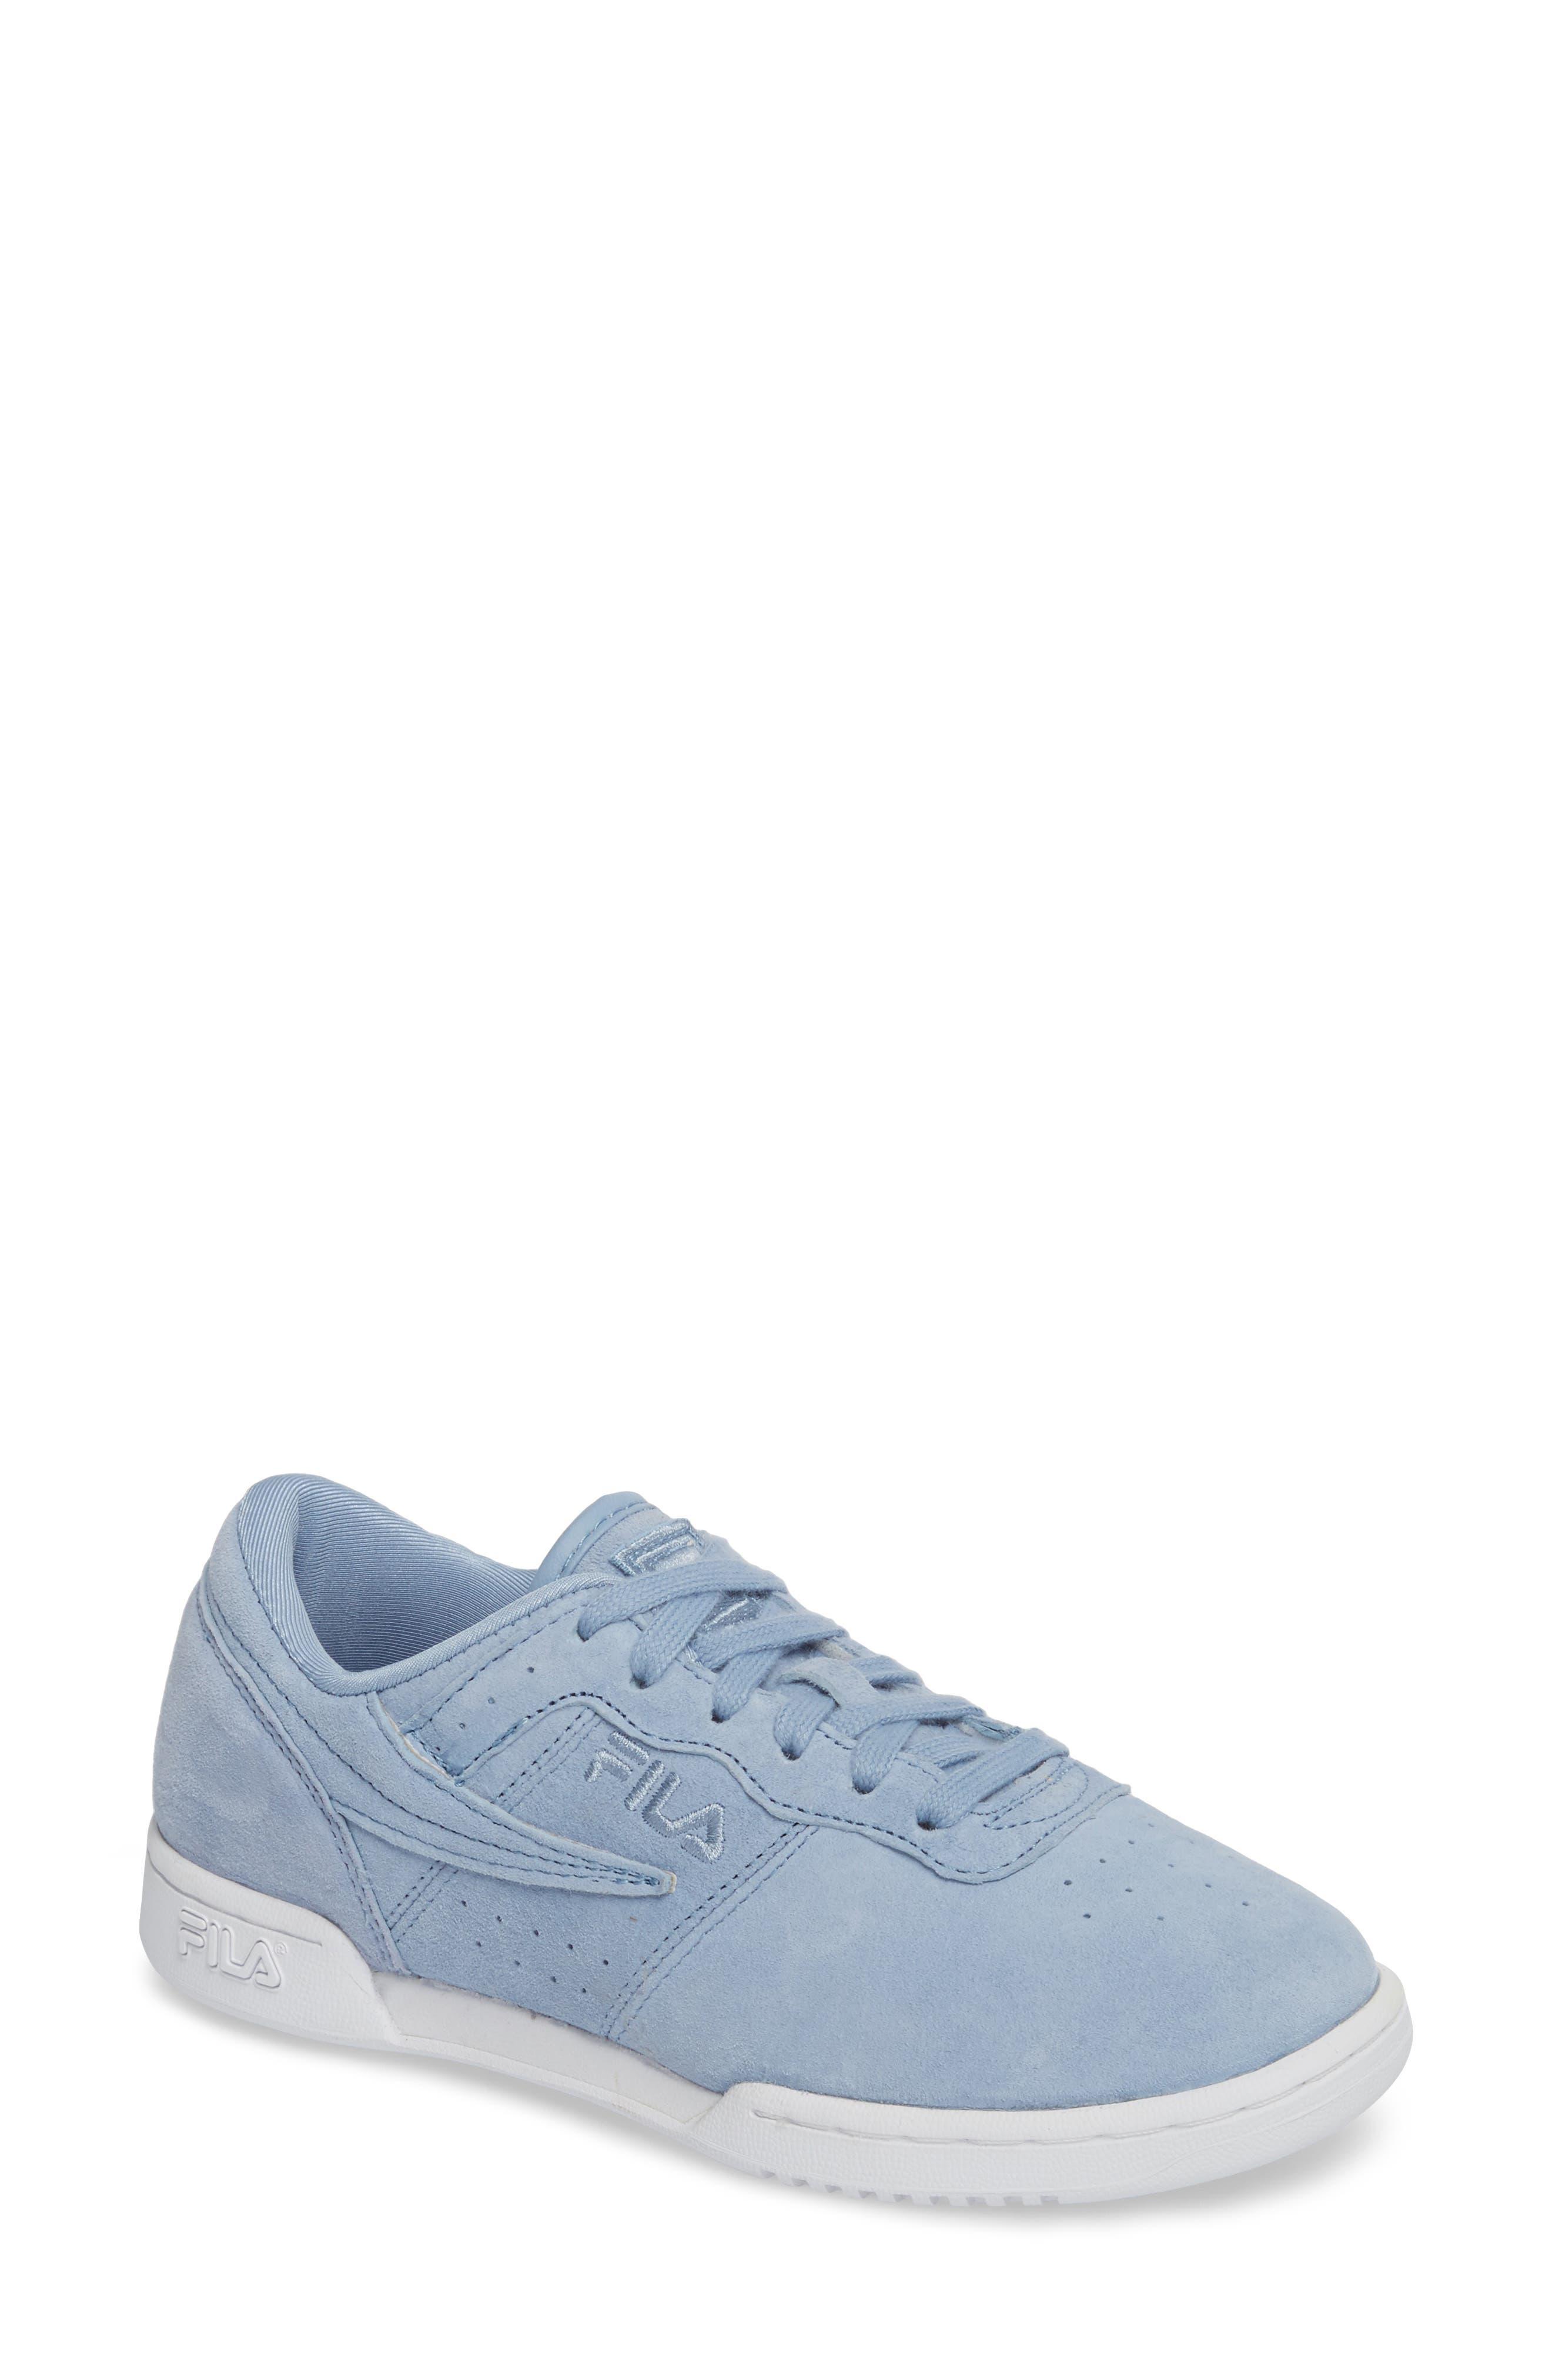 Original Fitness Premium Sneaker,                             Main thumbnail 1, color,                             BLUE/ WHITE